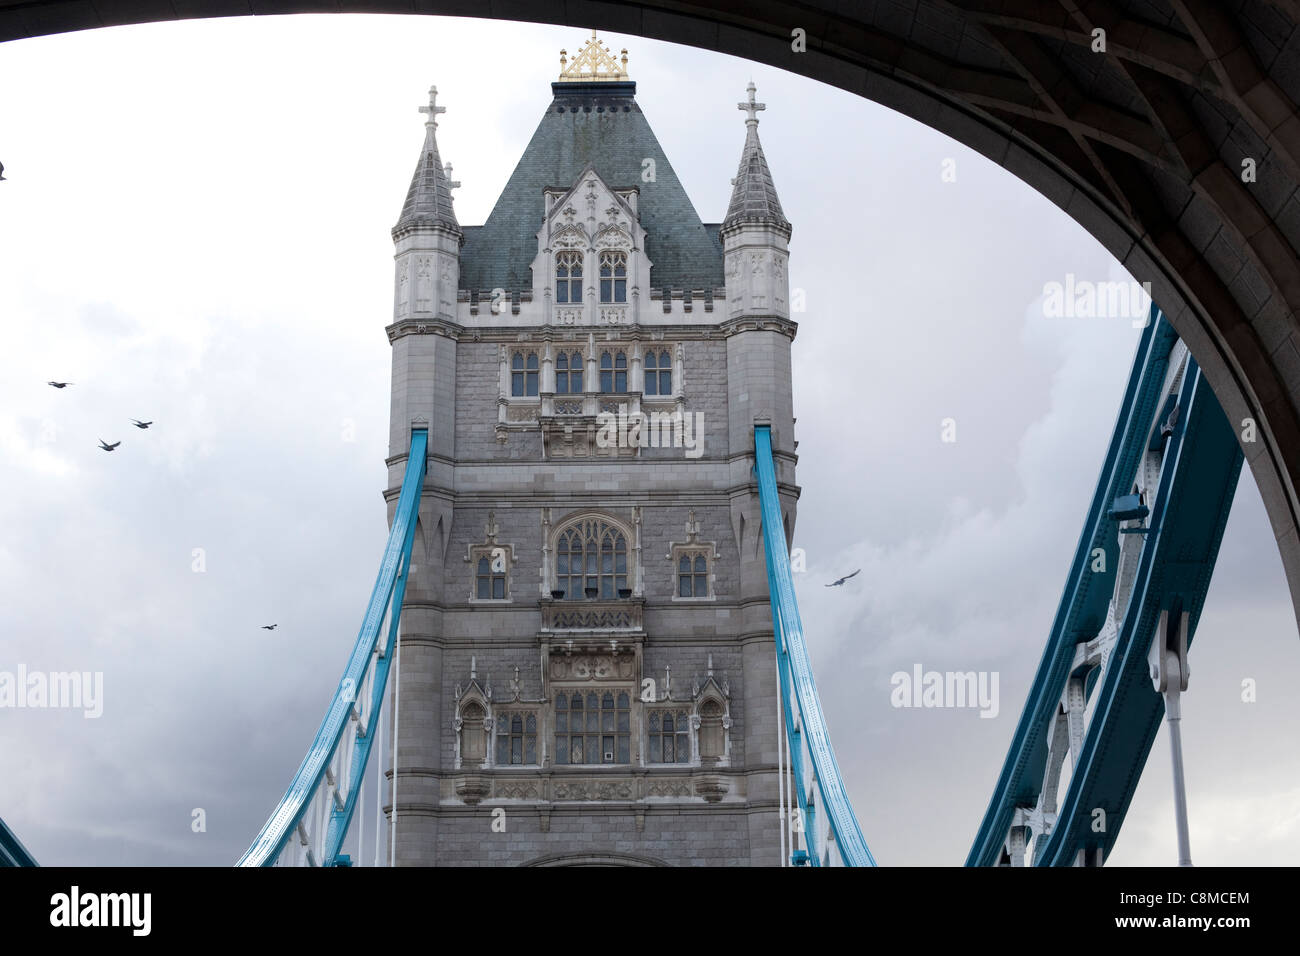 Tower Bridge, London - Stock Image